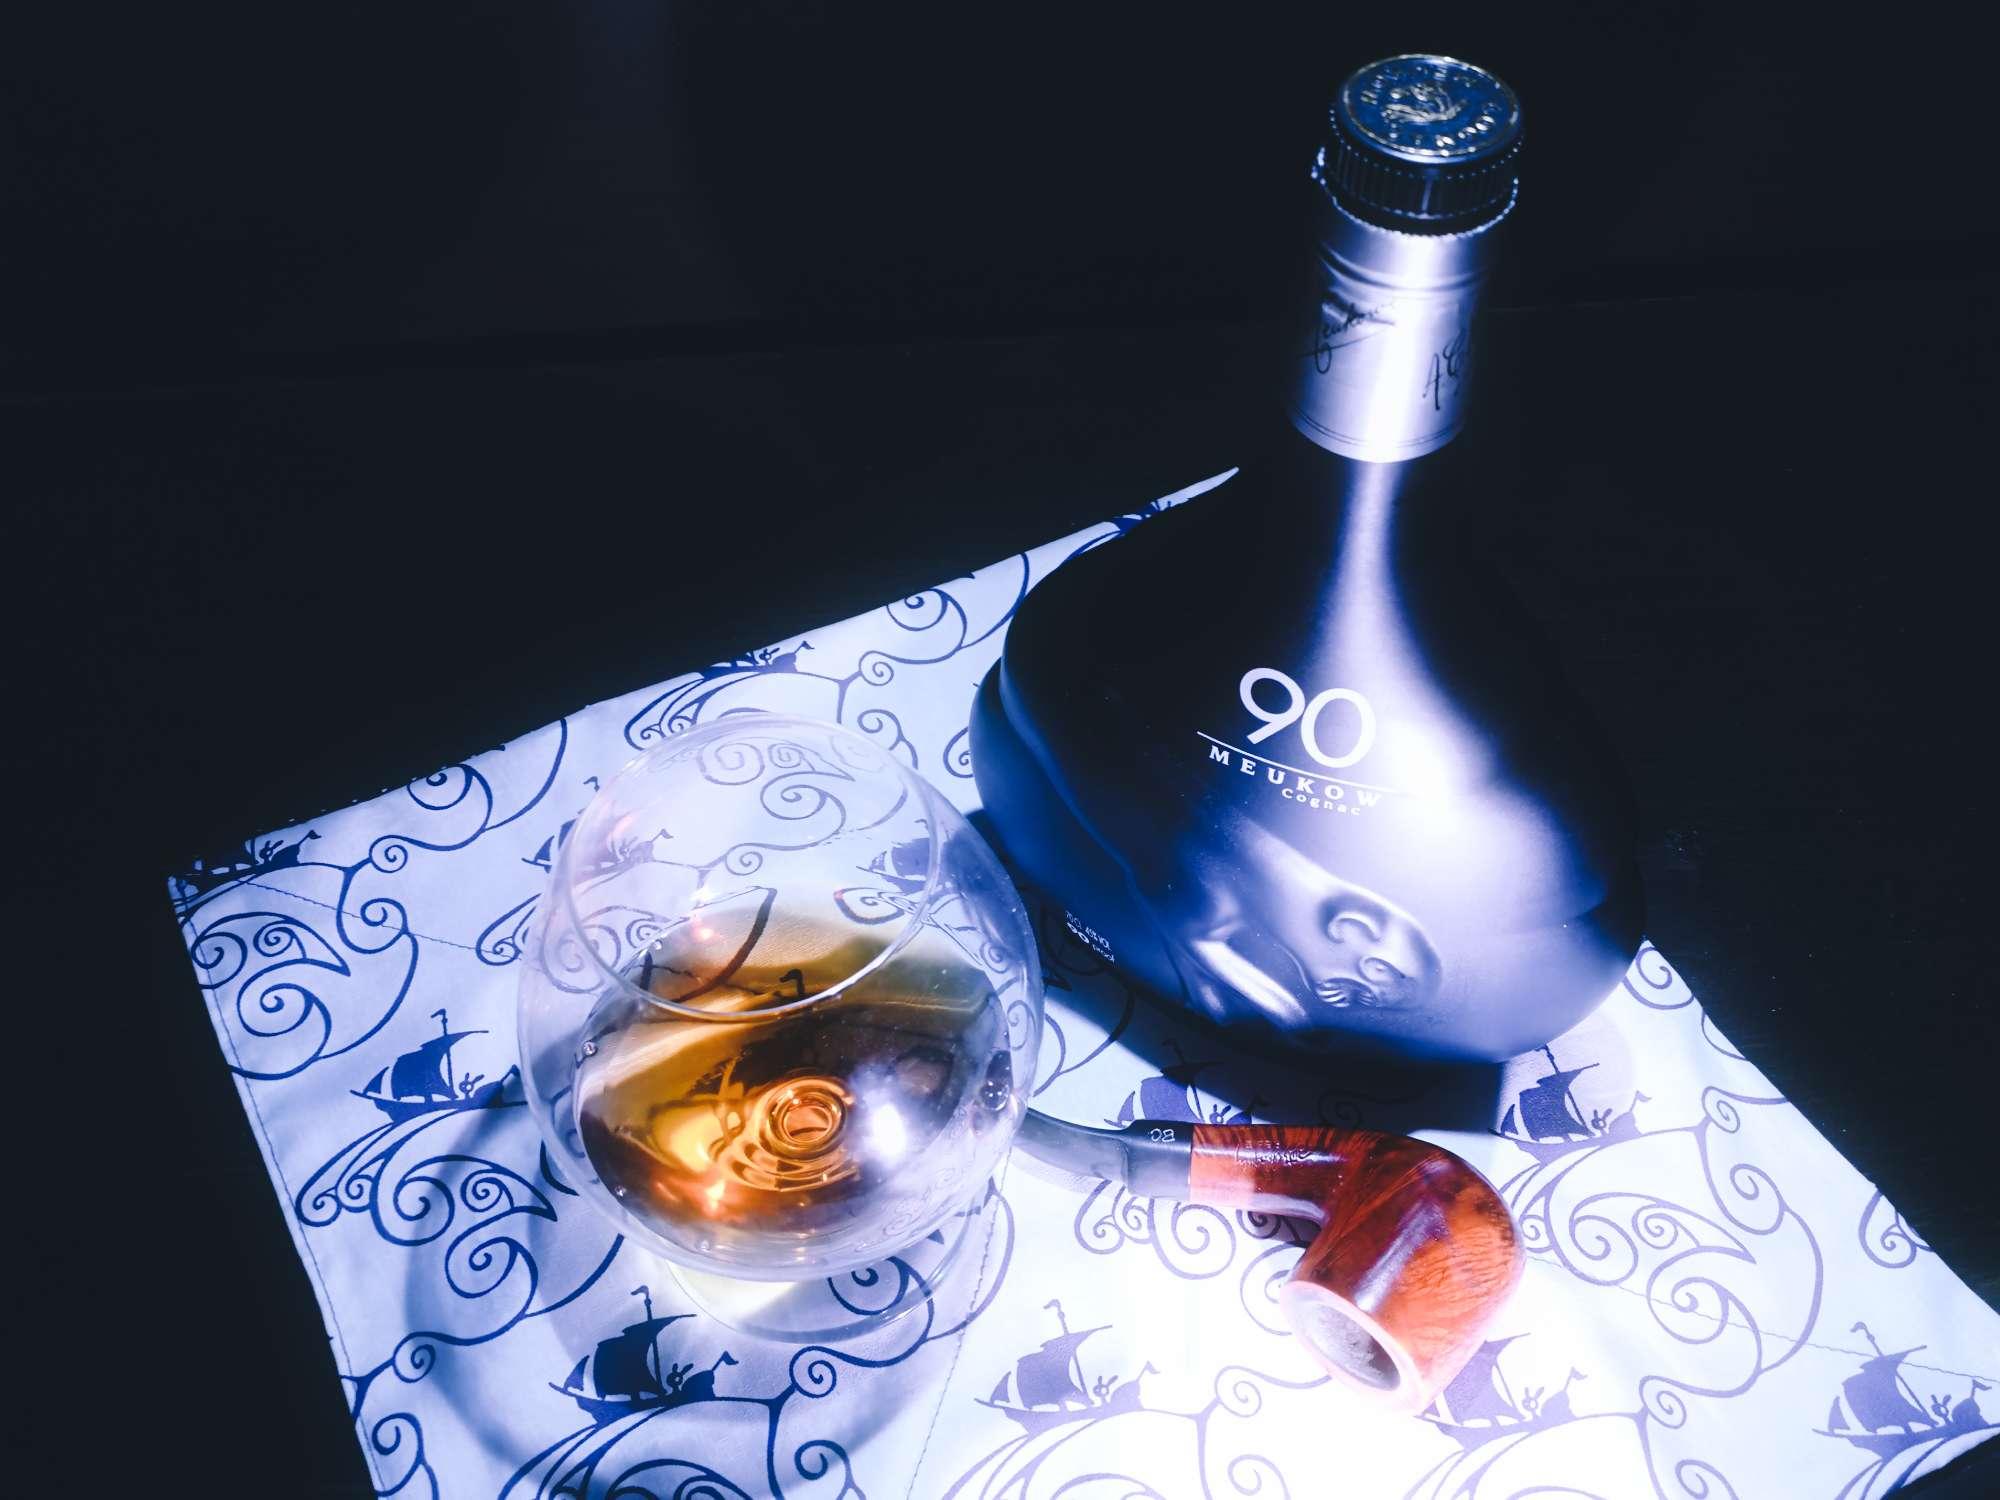 Meukow 90 Cognac Tasting Review LeGnac